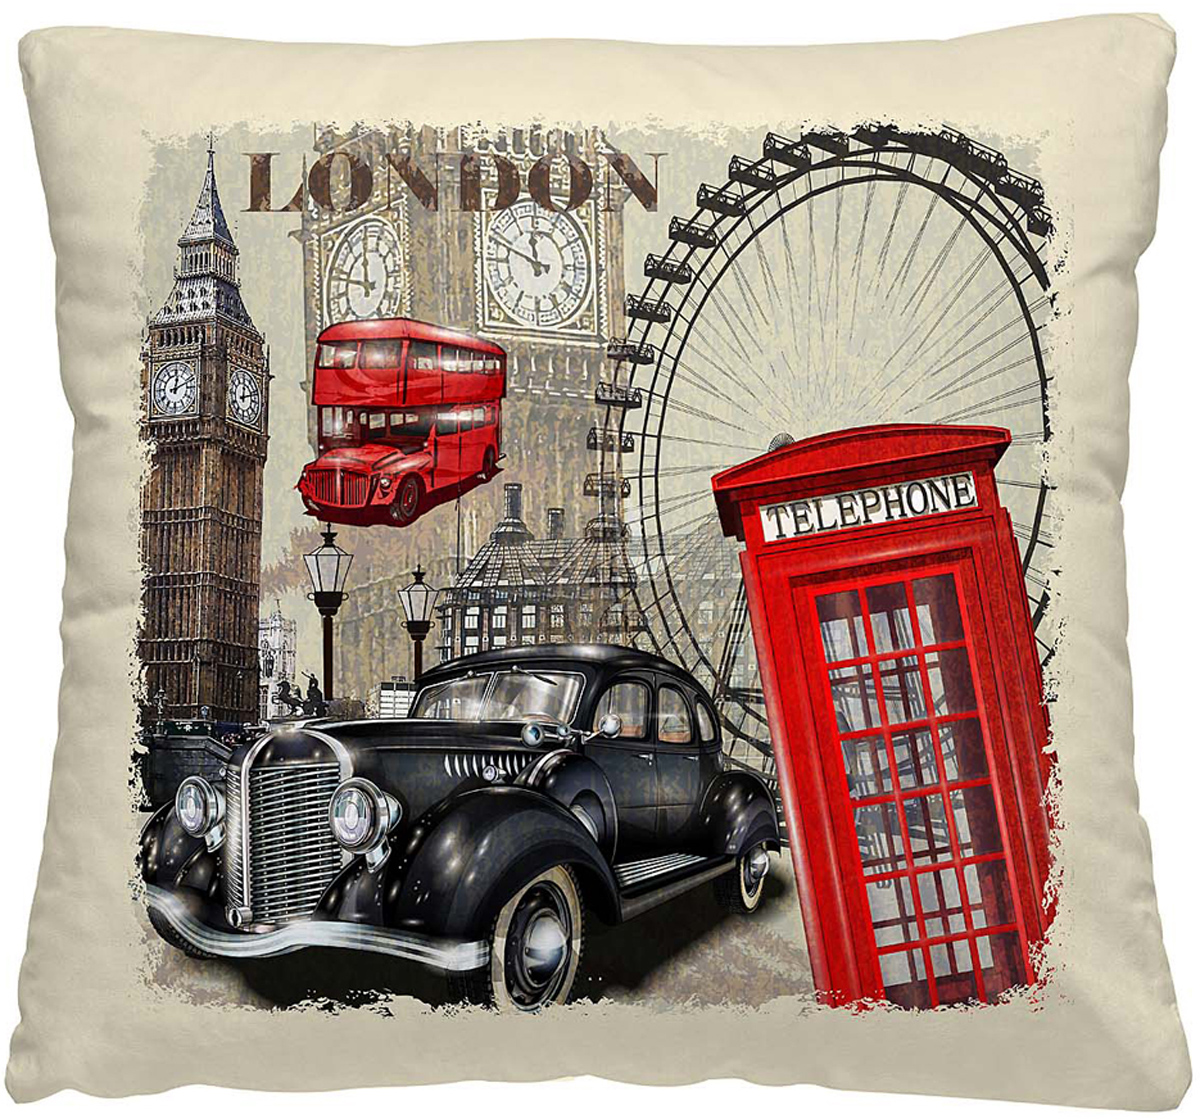 Подушка декоративная Волшебная ночь Лондон, 40х40 см подушка декоративная волшебная ночь колибри 40х40 см